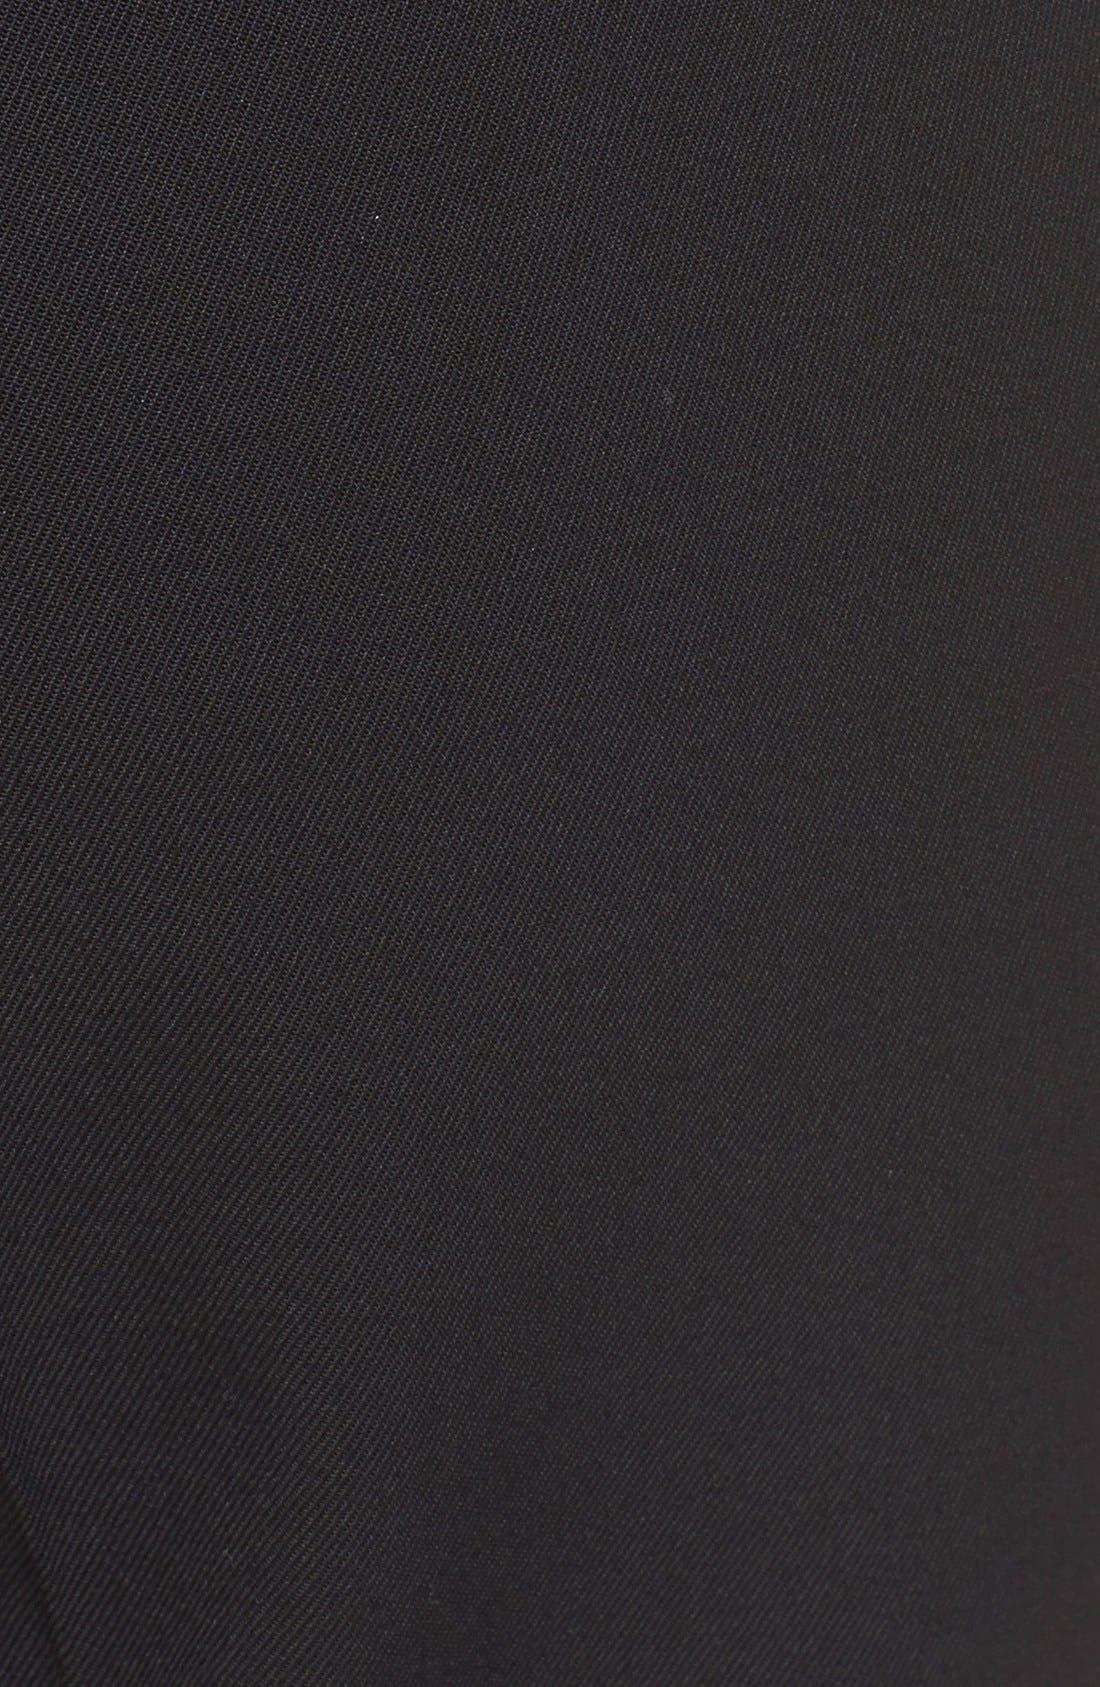 Alternate Image 3  - Michael Kors 'Samantha' Stretch Wool Straight Leg Pants